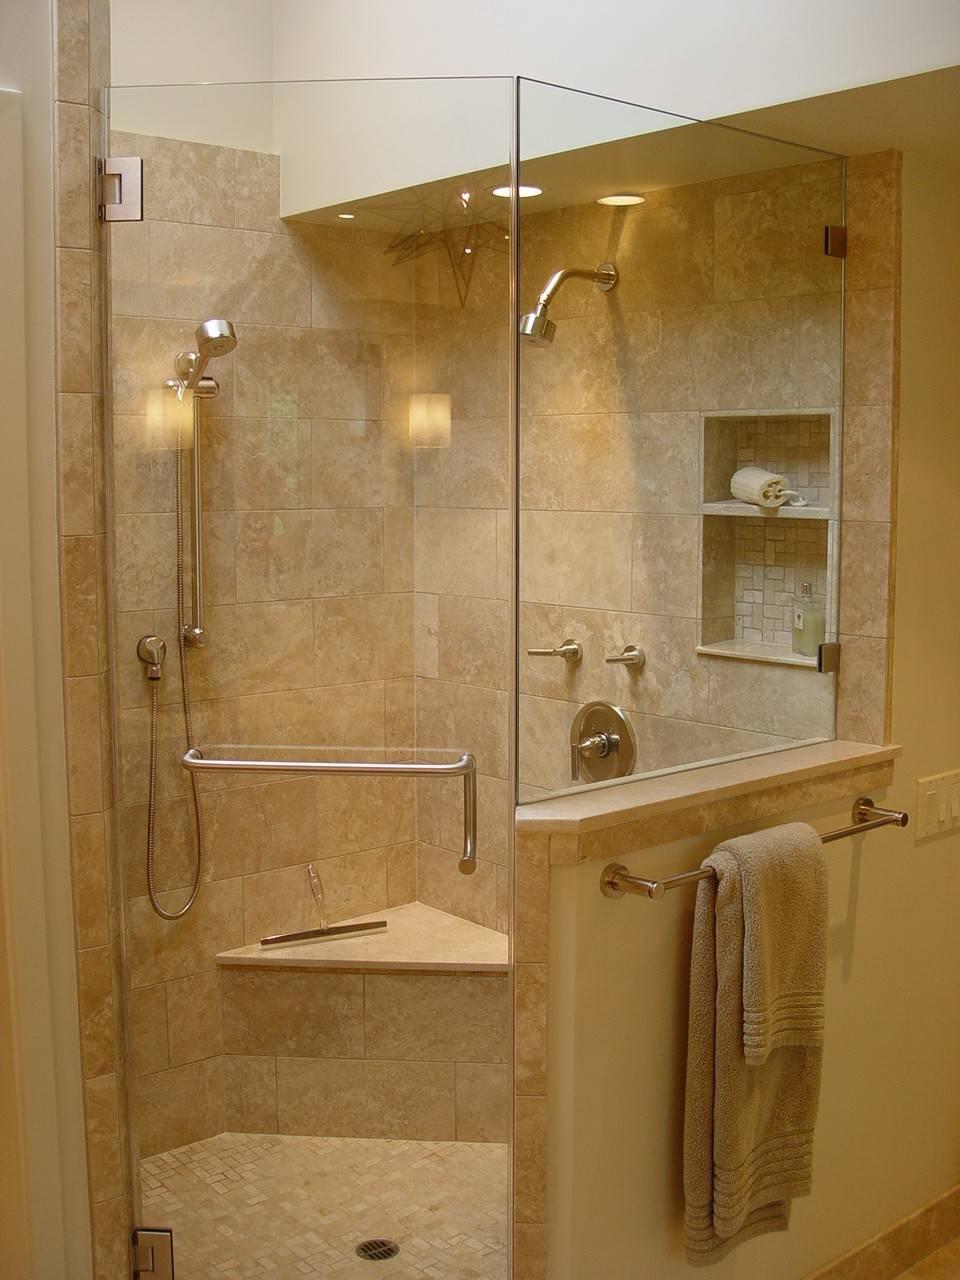 18 inch shower wall tiles ideas